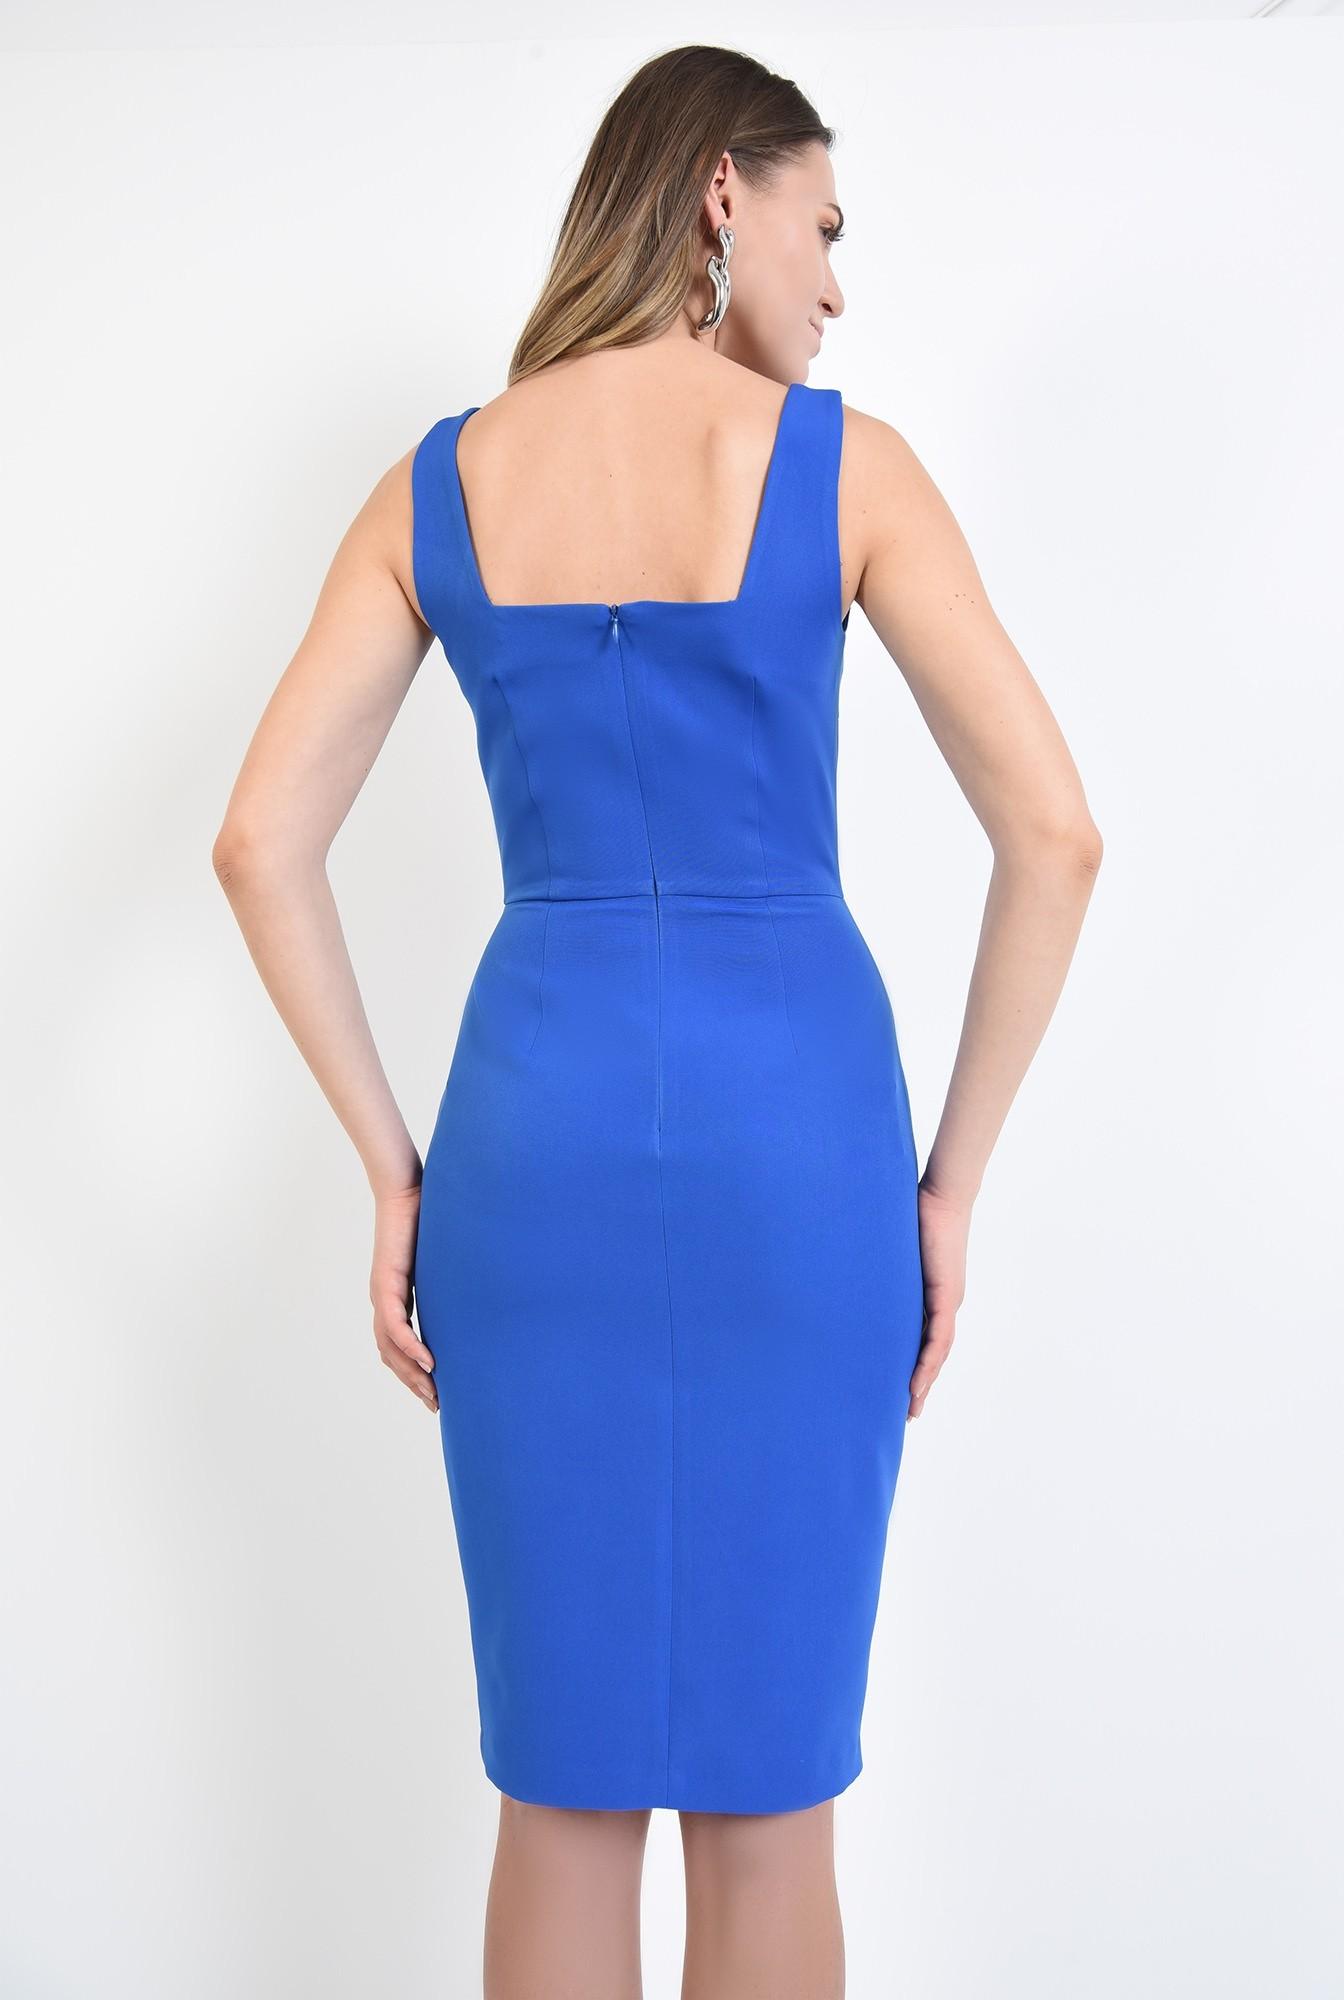 1 - 360 - rochie albastra, cu bretele, de ocazie, cu decolteu